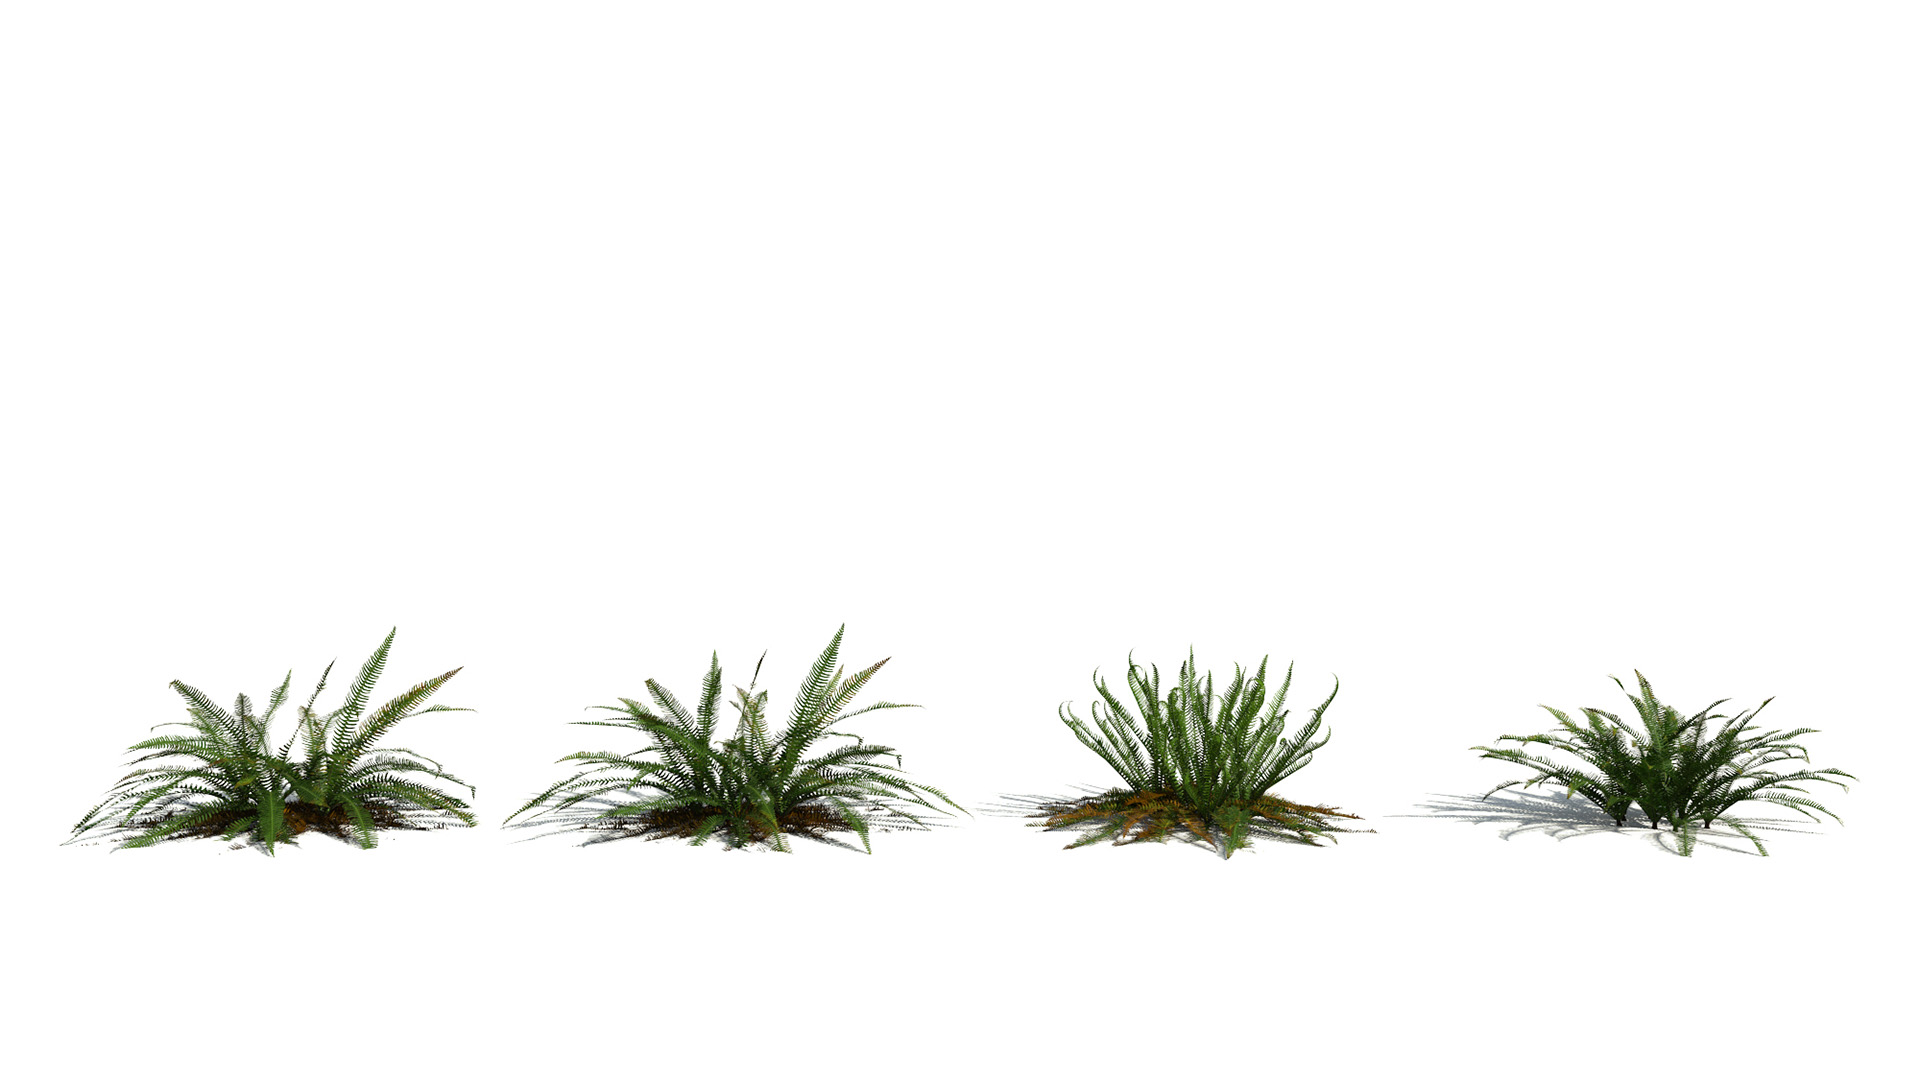 3D model of the Deer fern Blechnum spicant season variations